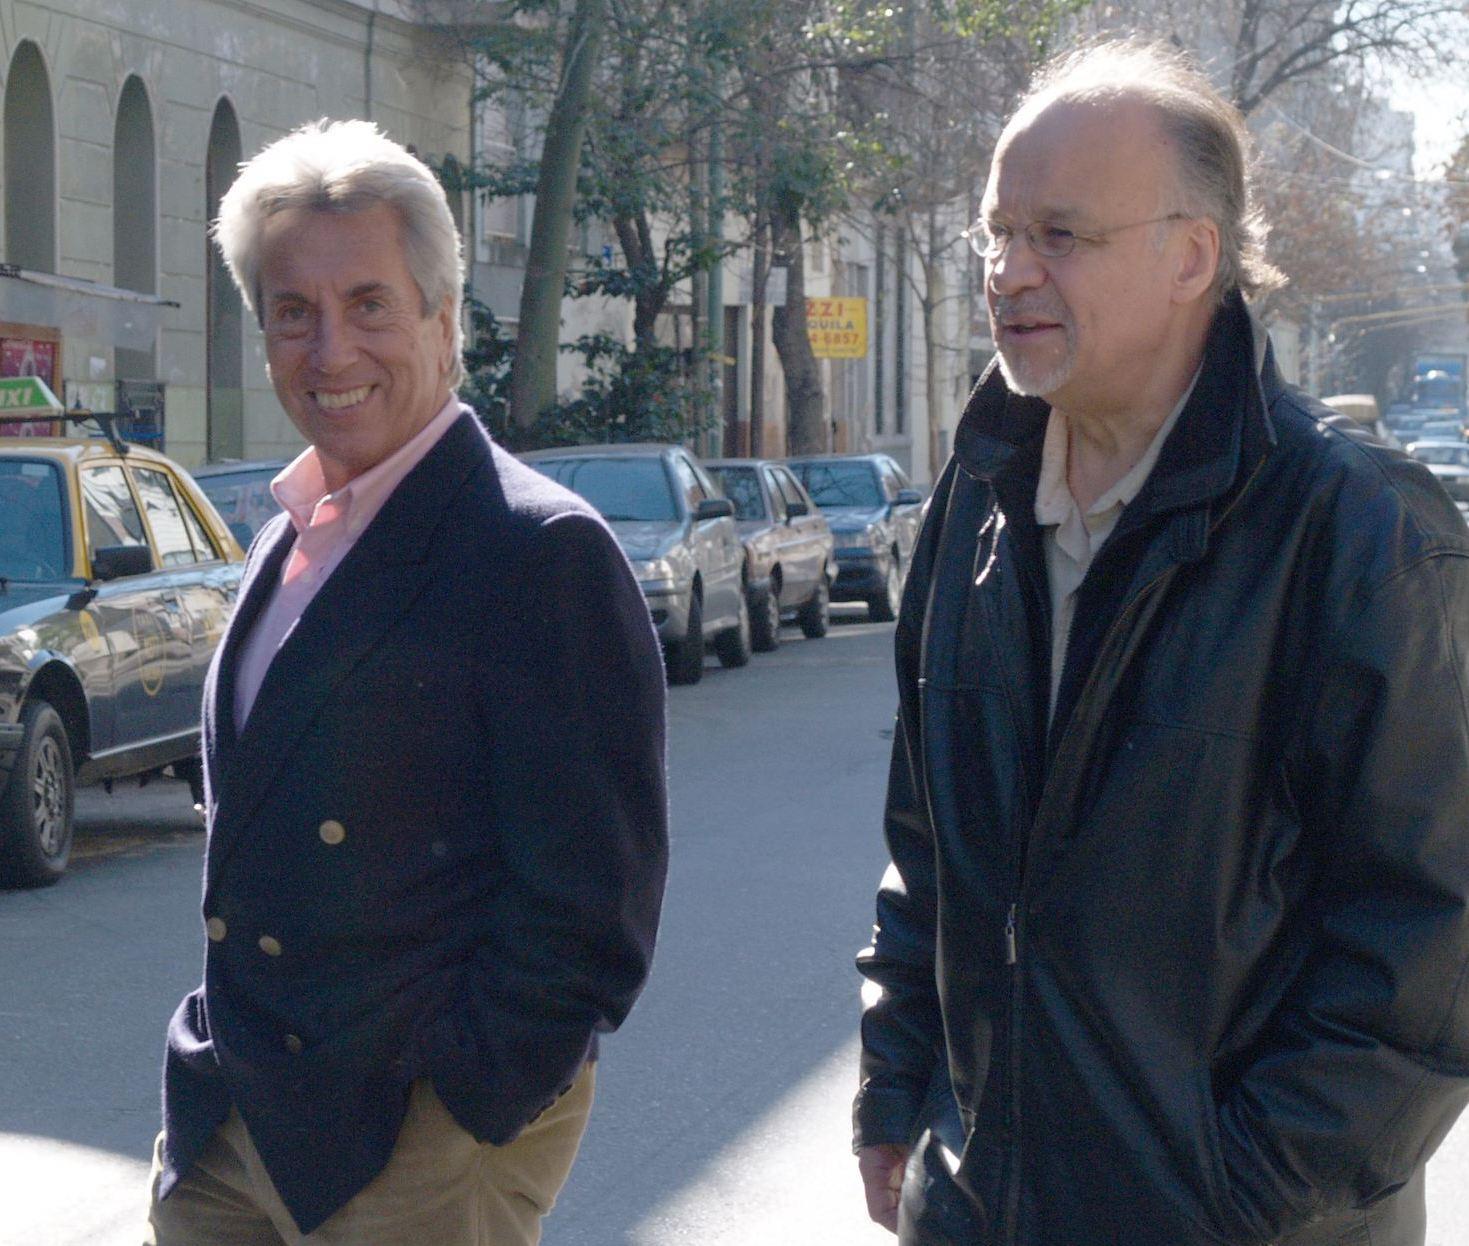 http://argentjazz.com.ar/wp-content/uploads/2013/12/BAJ.11-Jorge-Navarro-y-Gustavo-Bergalli.jpg